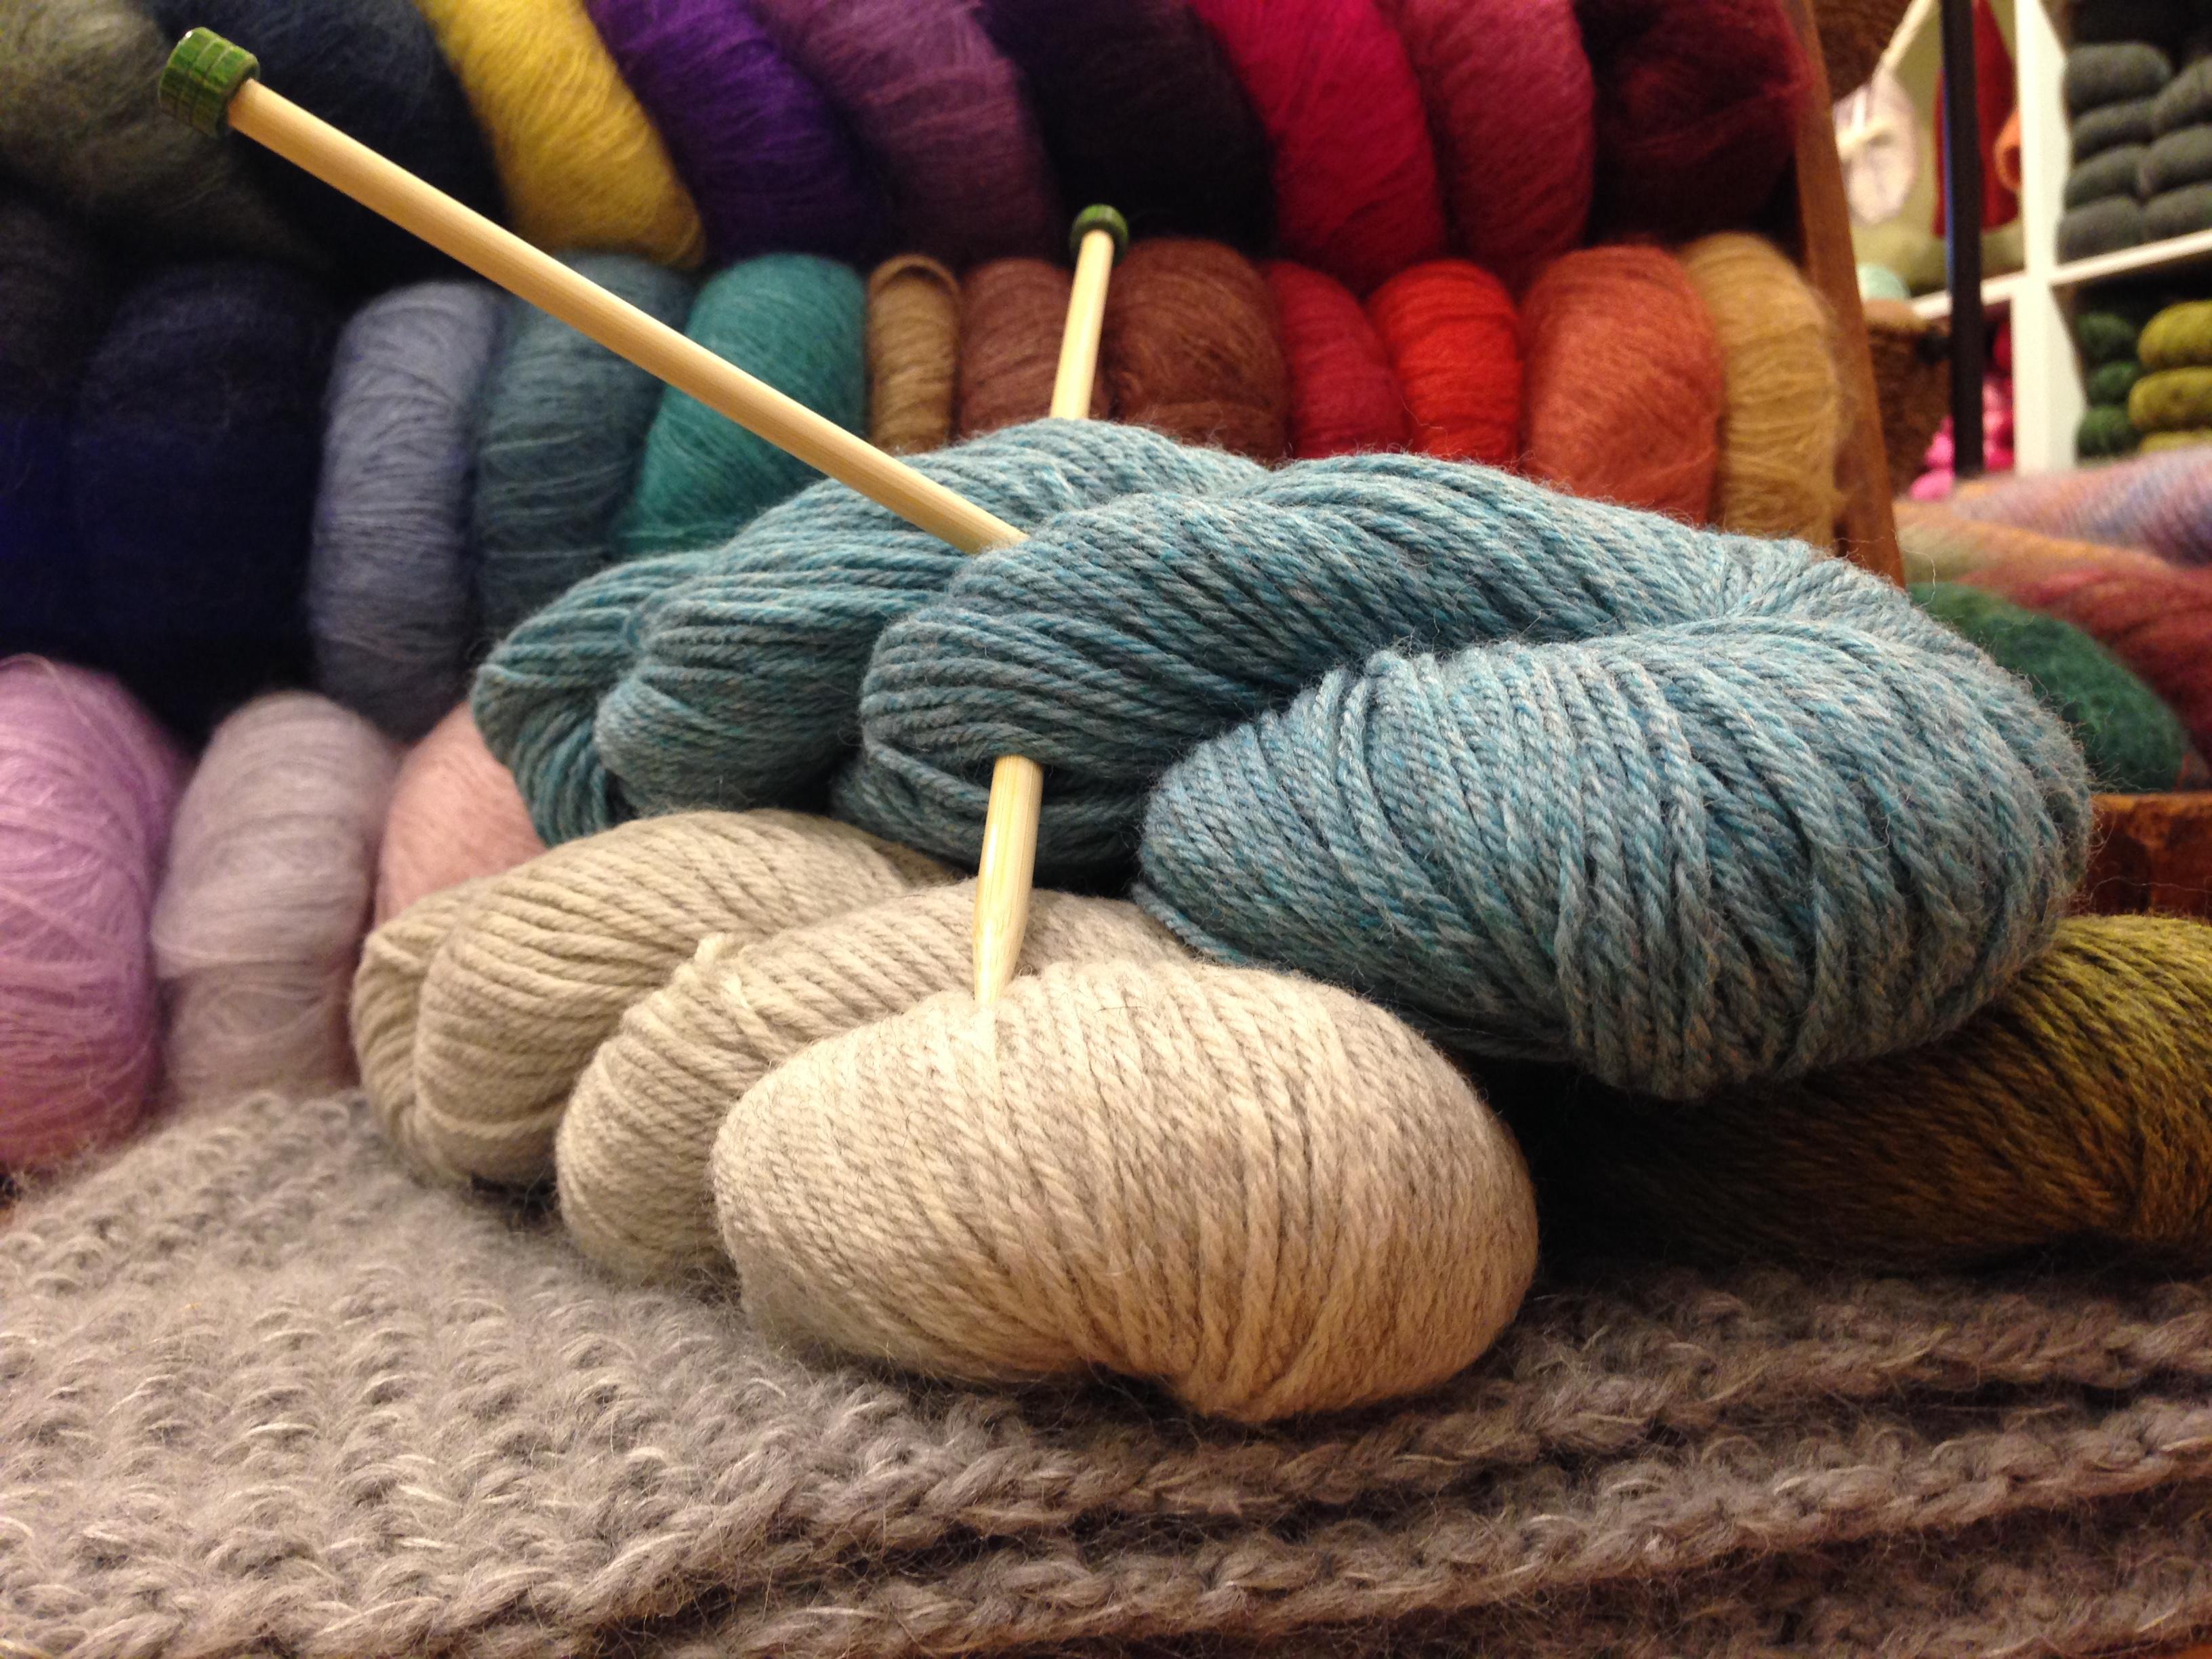 Knitting Lessons For Beginners : Beginner knitting three bags full yarn store vancouver